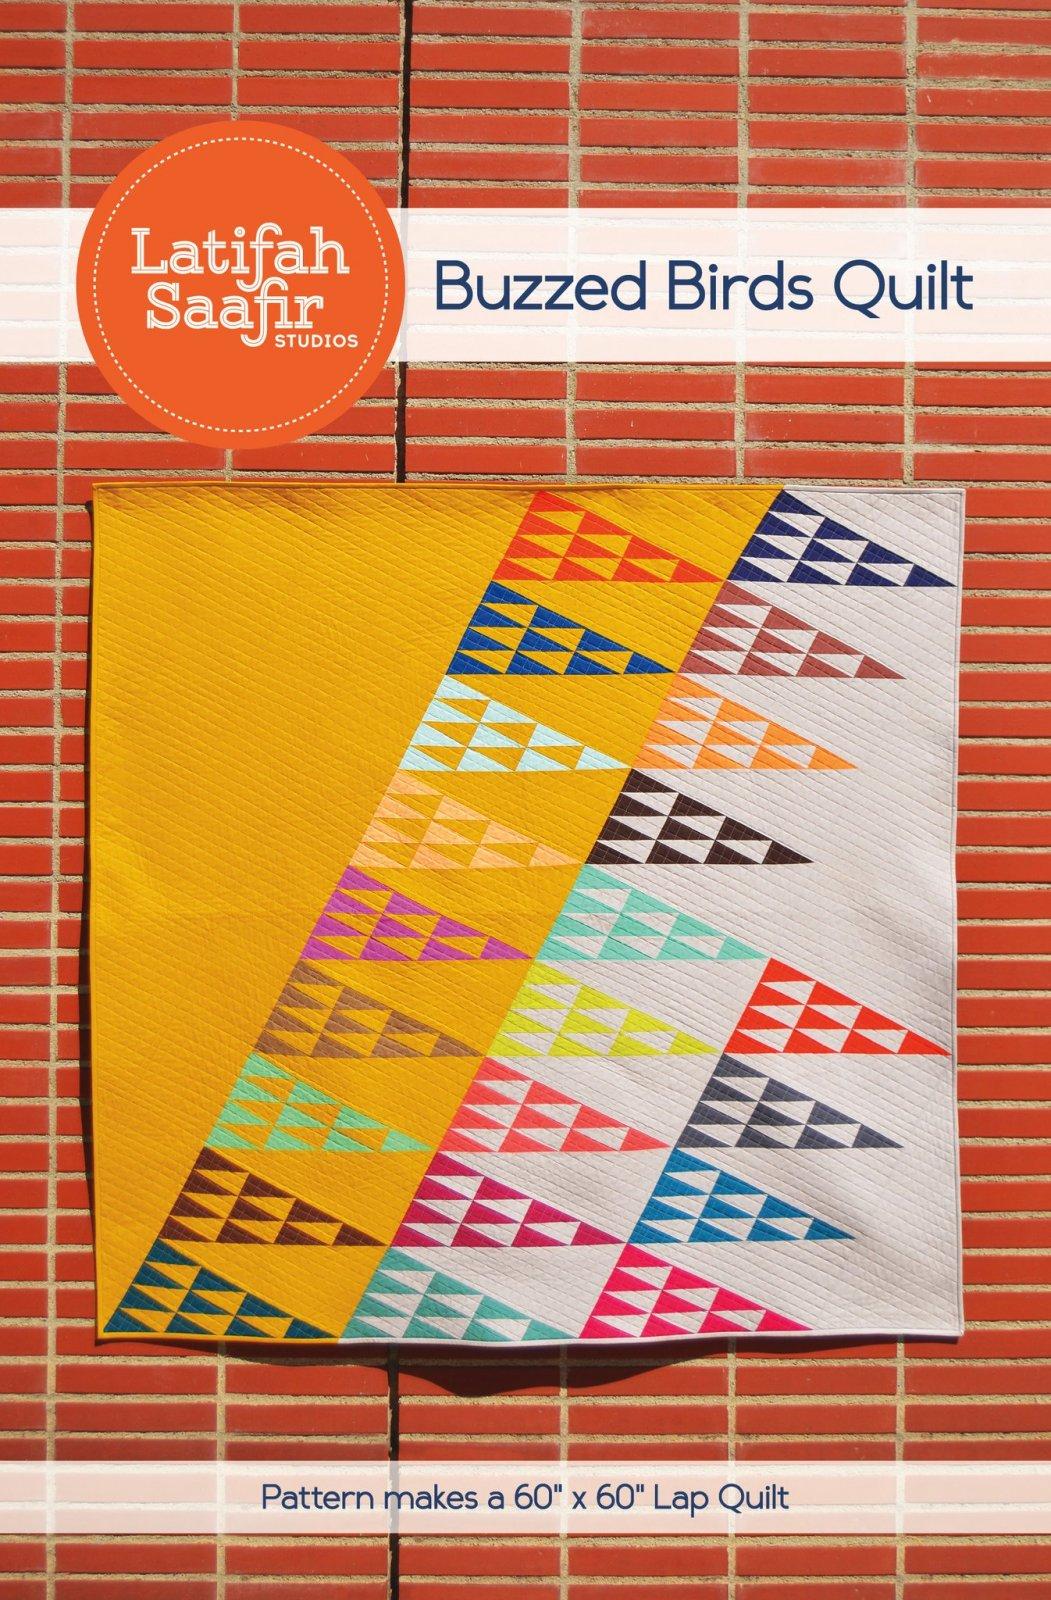 Buzzed Birds Quilt Pattern